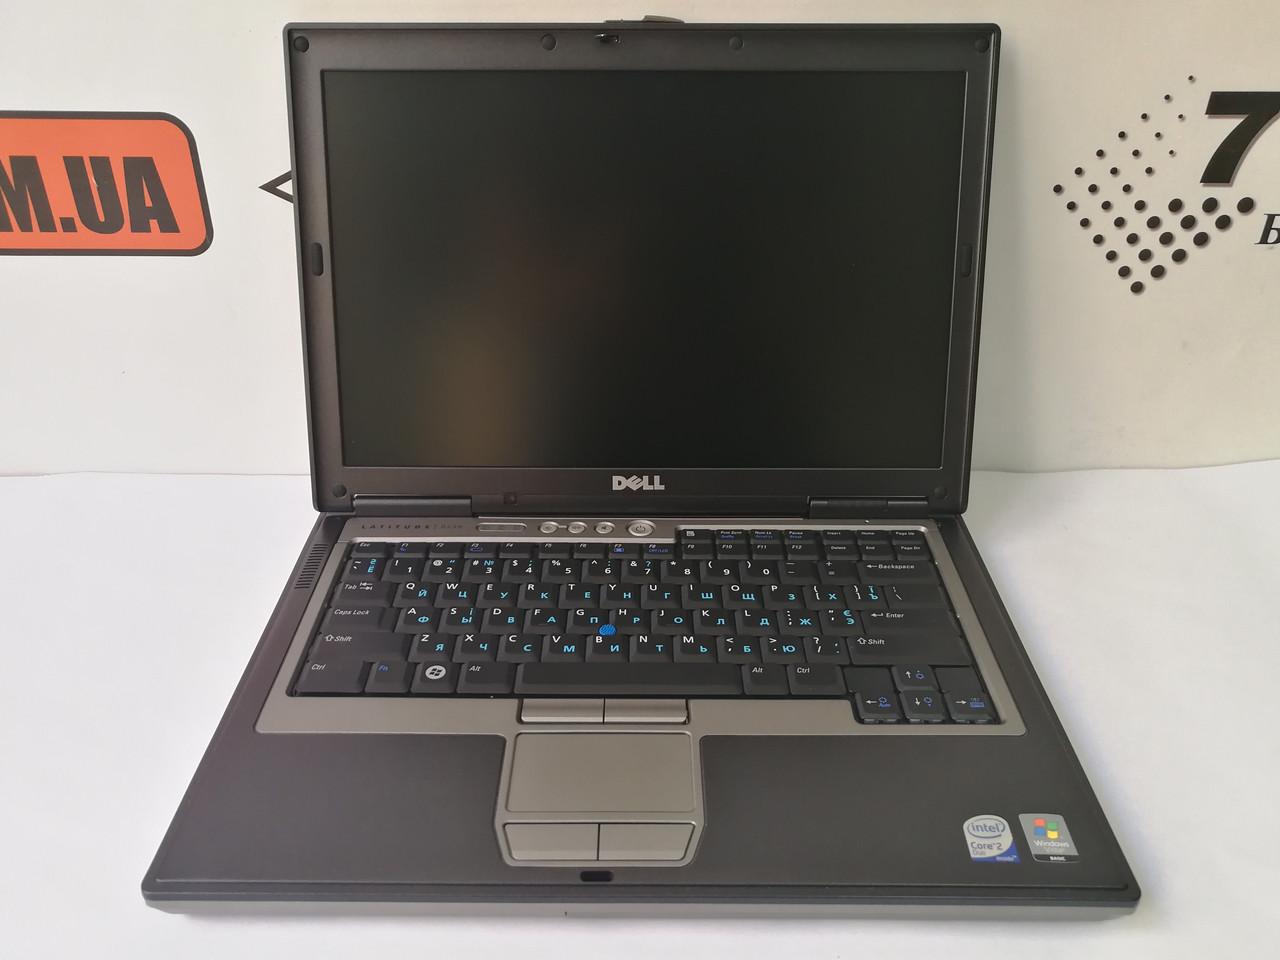 "Ноутбук Dell D630, (1280×800) 14"", Intel Core2Duo T7500 2.2GHz, RAM 3ГБ, HDD 80ГБ"